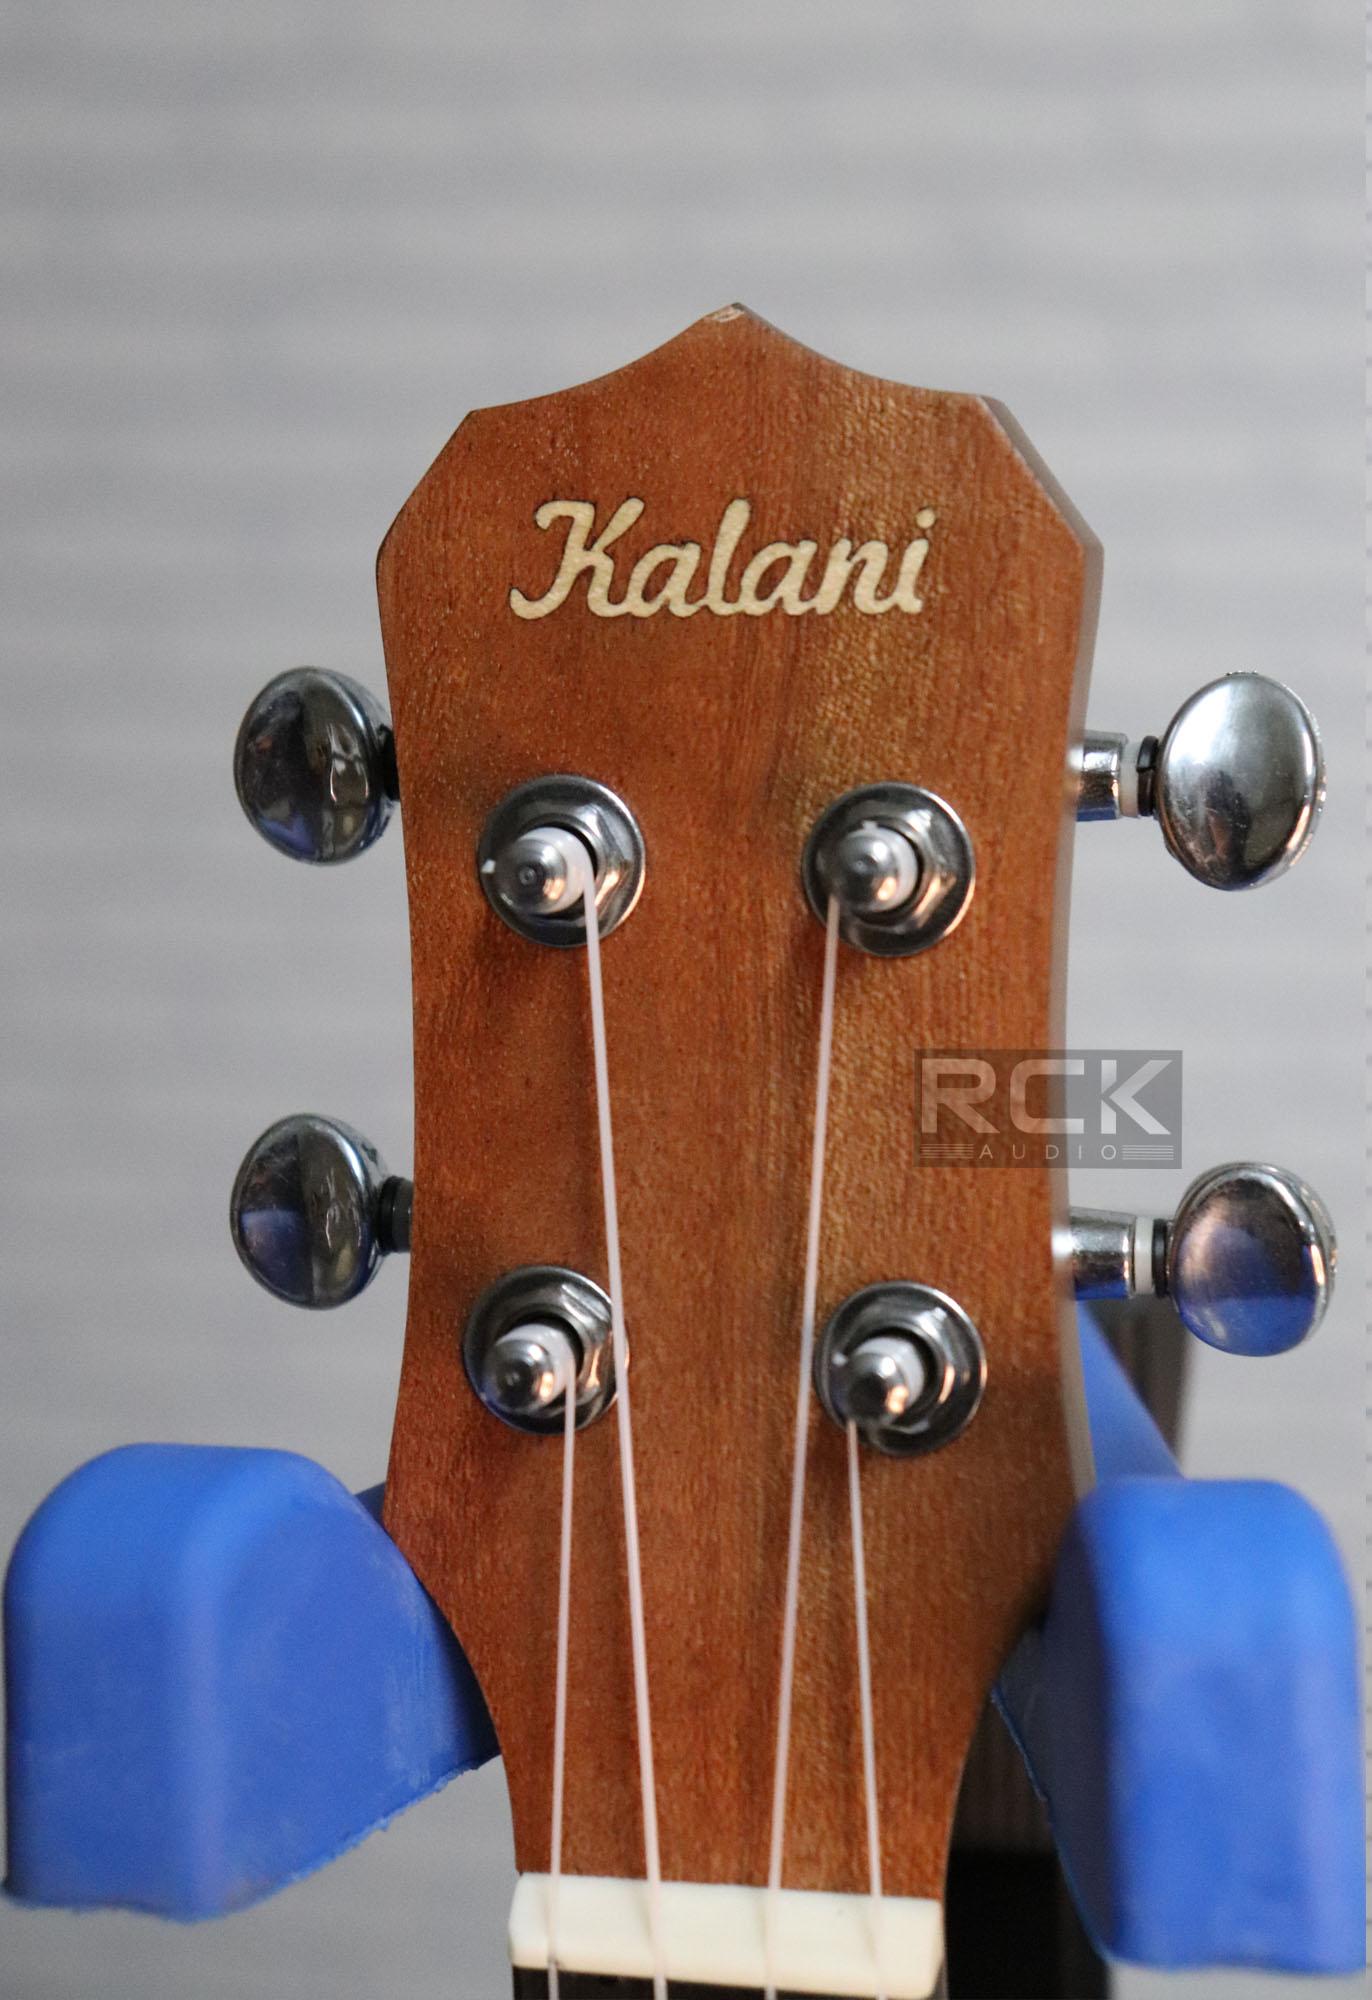 Ukulele Concert 24 Kalani Tribes Series KAL 200 CT com Bag